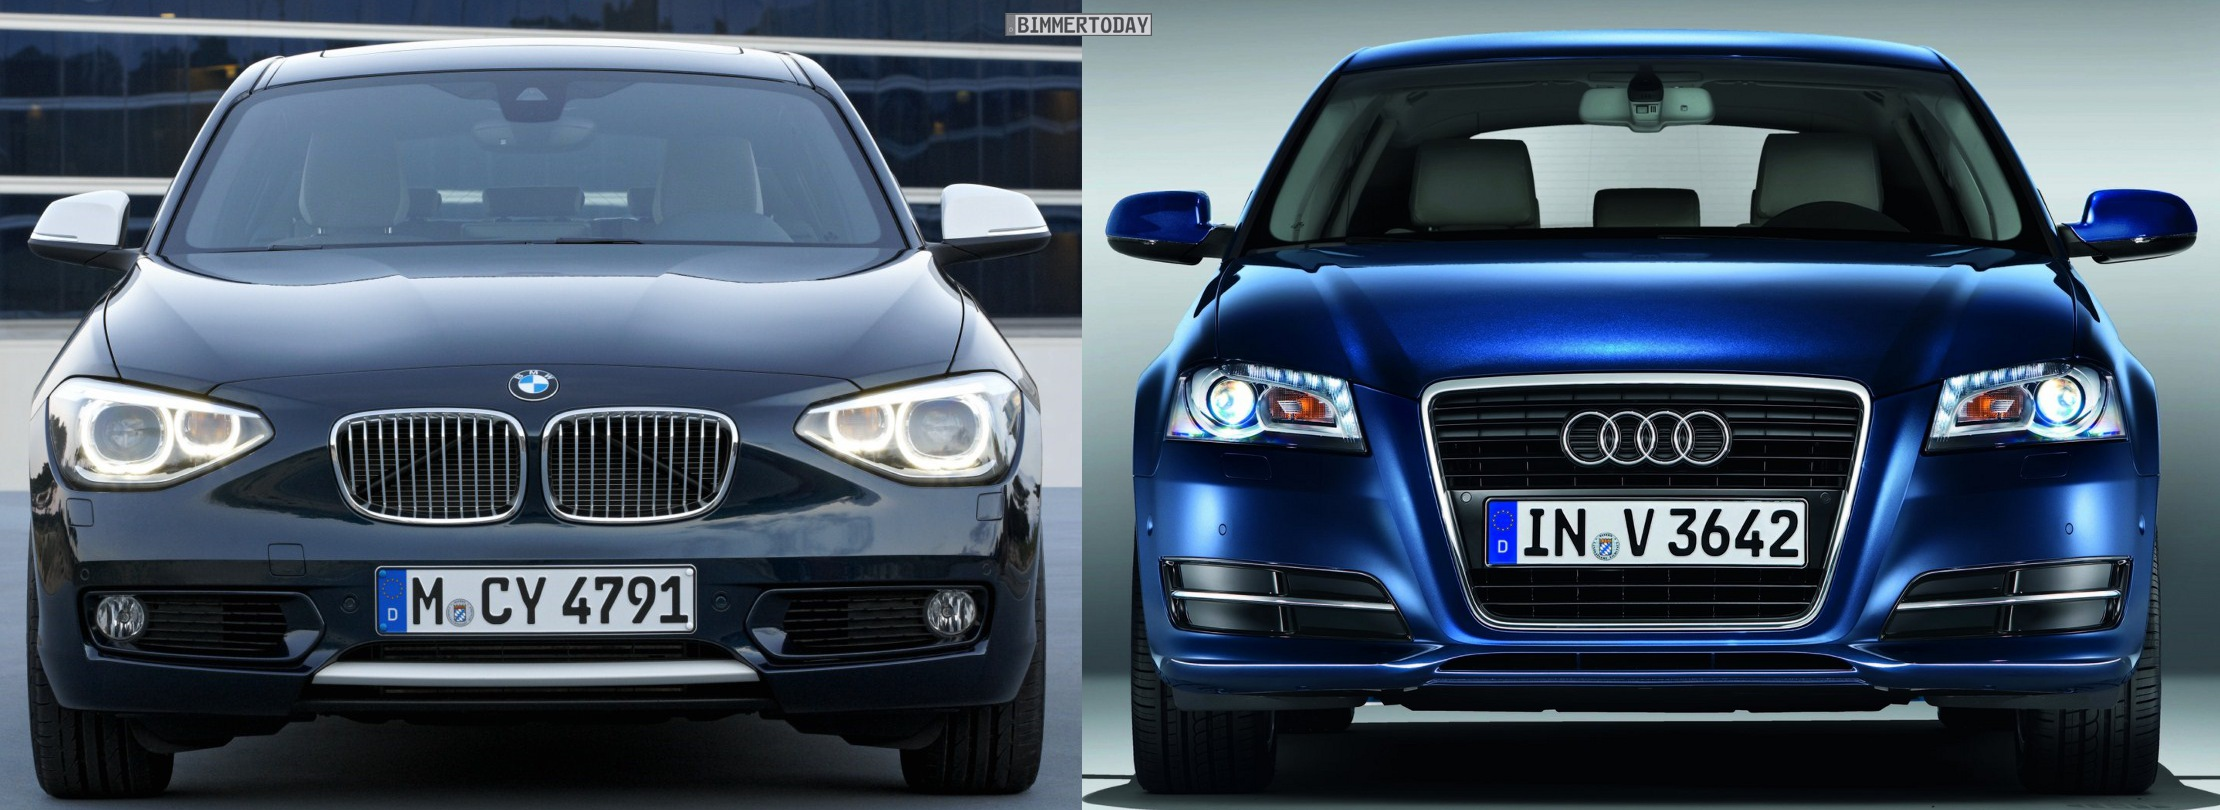 Photo Comparison 2012 Bmw 1 Series Vs Audi A3